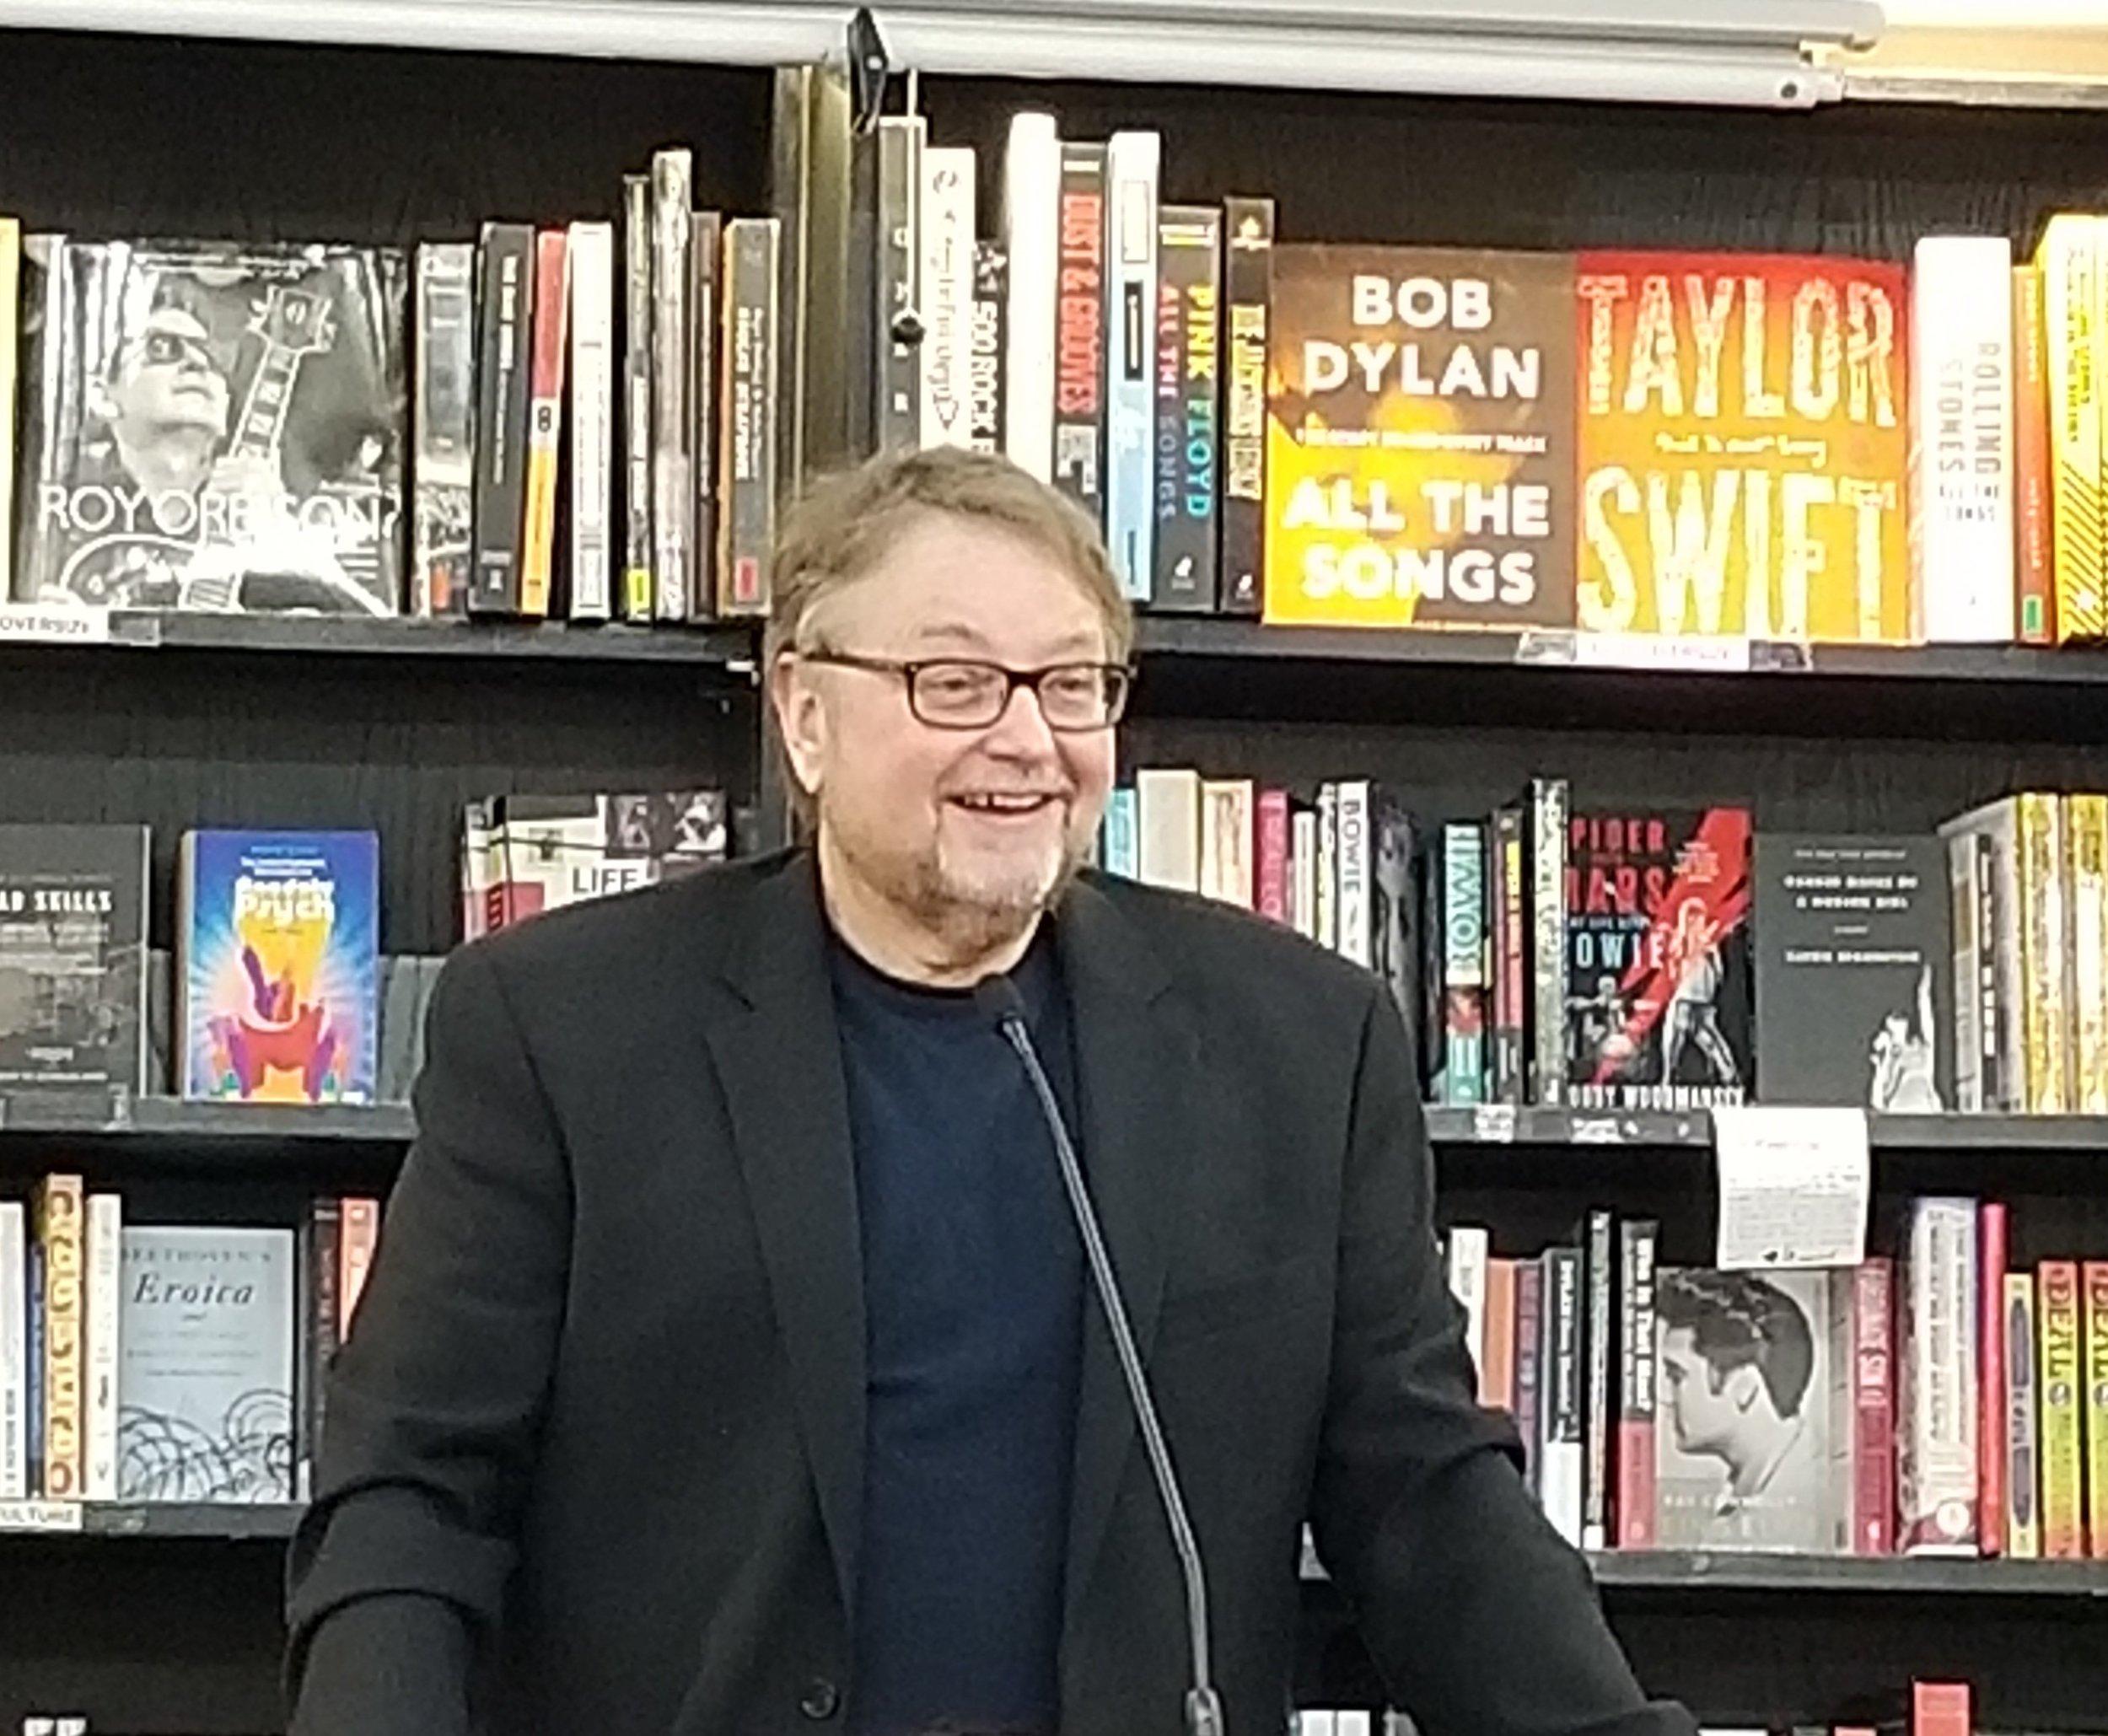 Luis Alberto Urrea discussing his book  The House of Broken Angels at  Bookshop Santa Cruz .